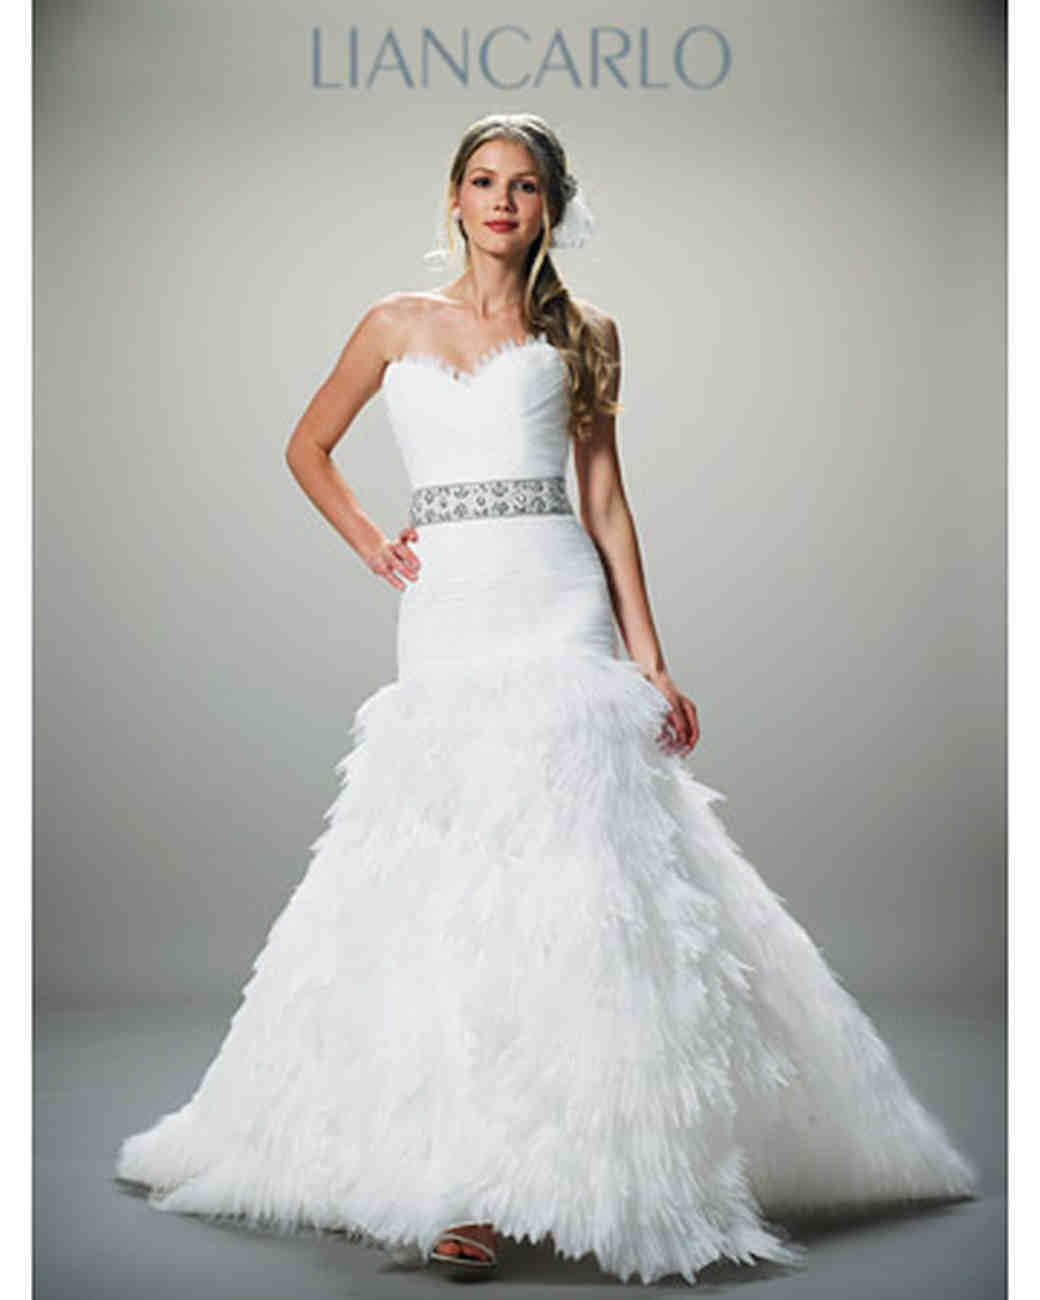 Platinum edition wedding dresses  Pin by jooana on wedding ideas for you  Pinterest  Wedding dresses